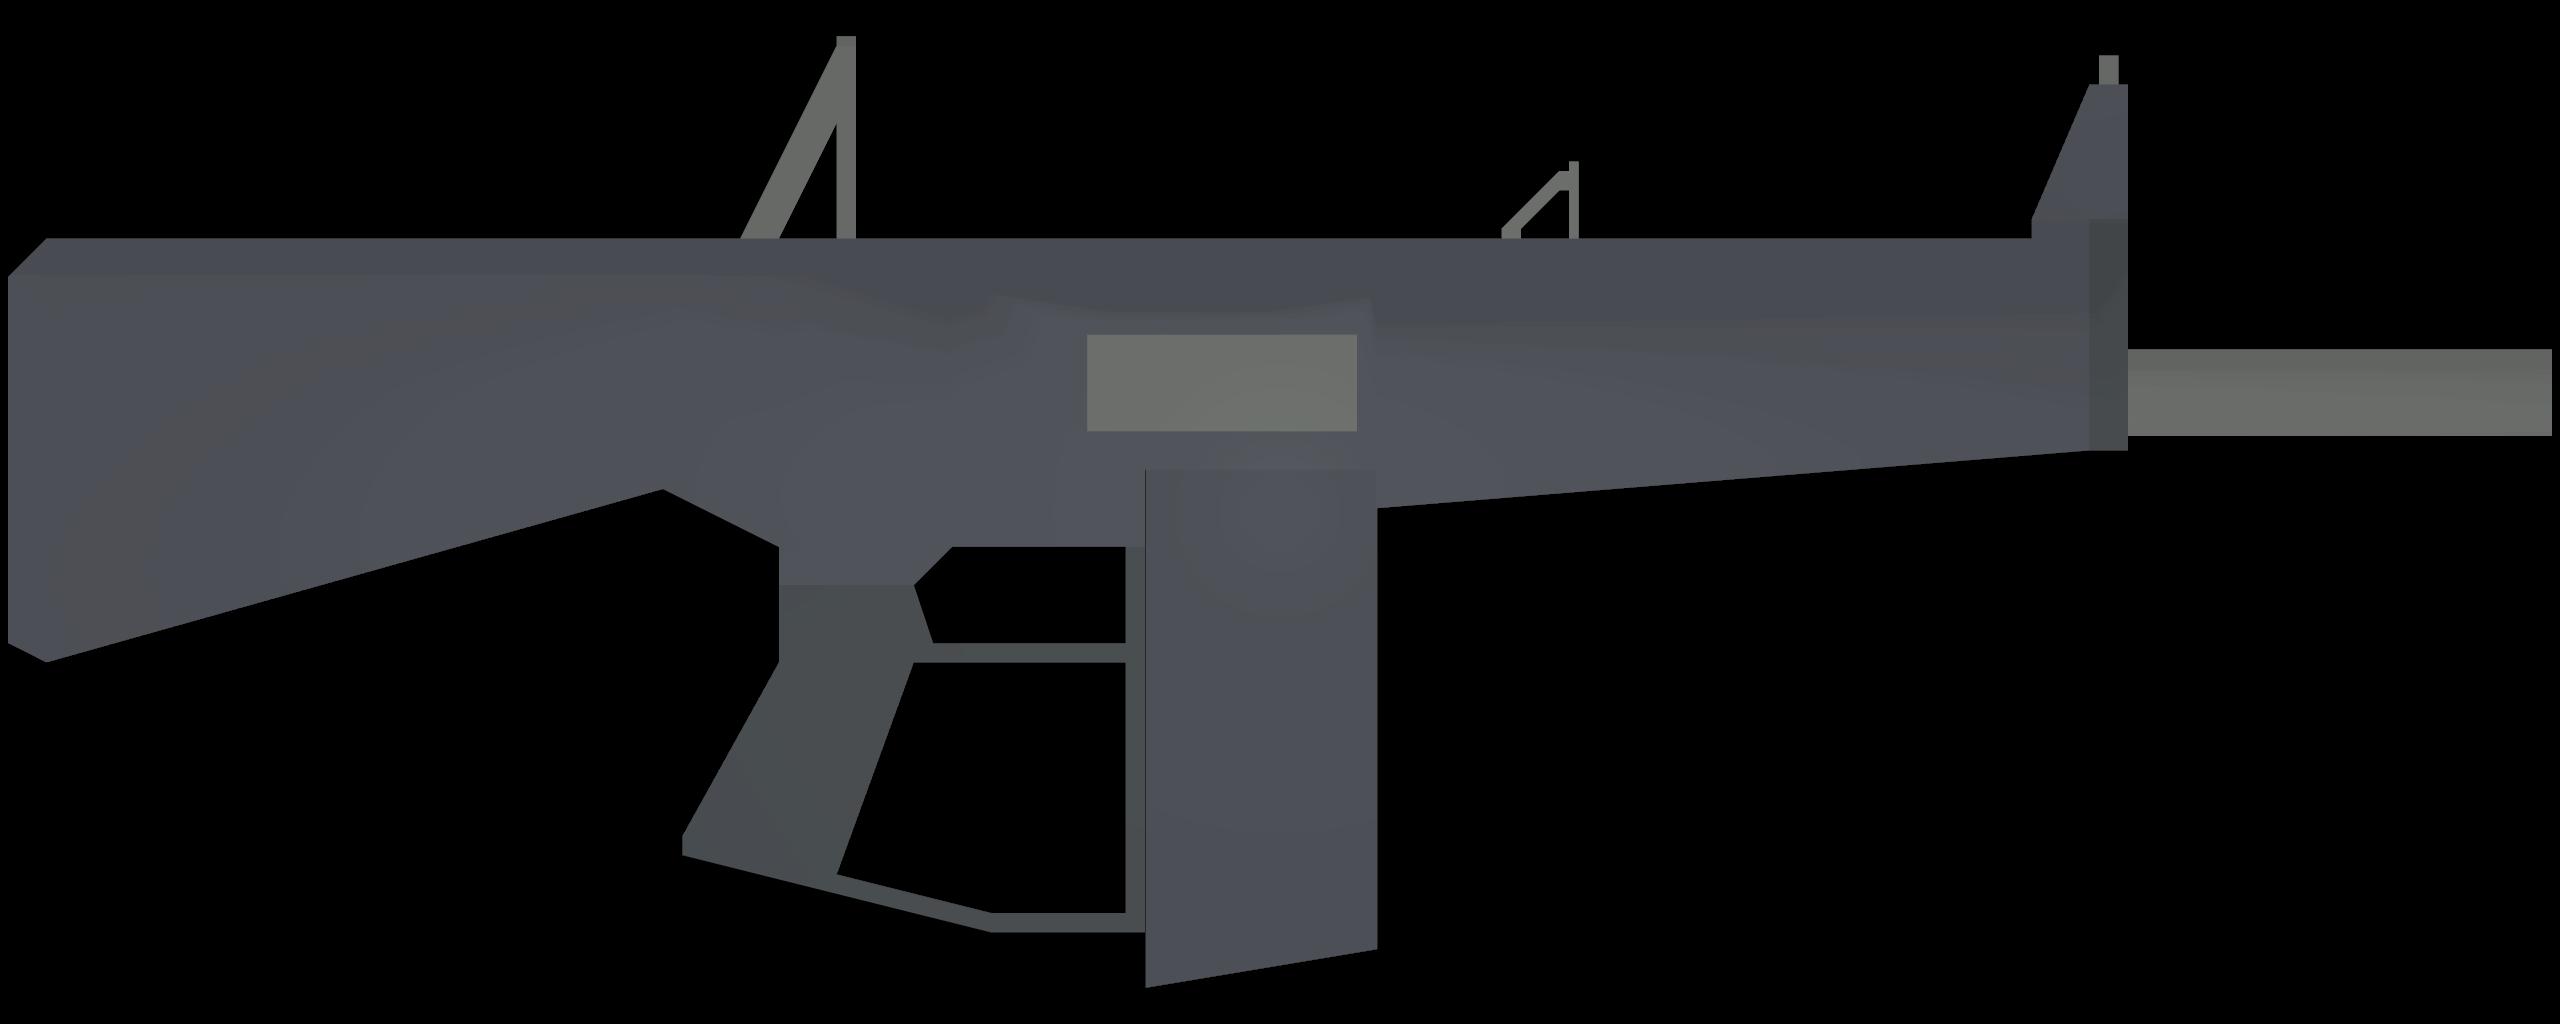 Unturned Uncreated Warfare Mods & All ID List + Attachments - USA Weapons - E3836E8